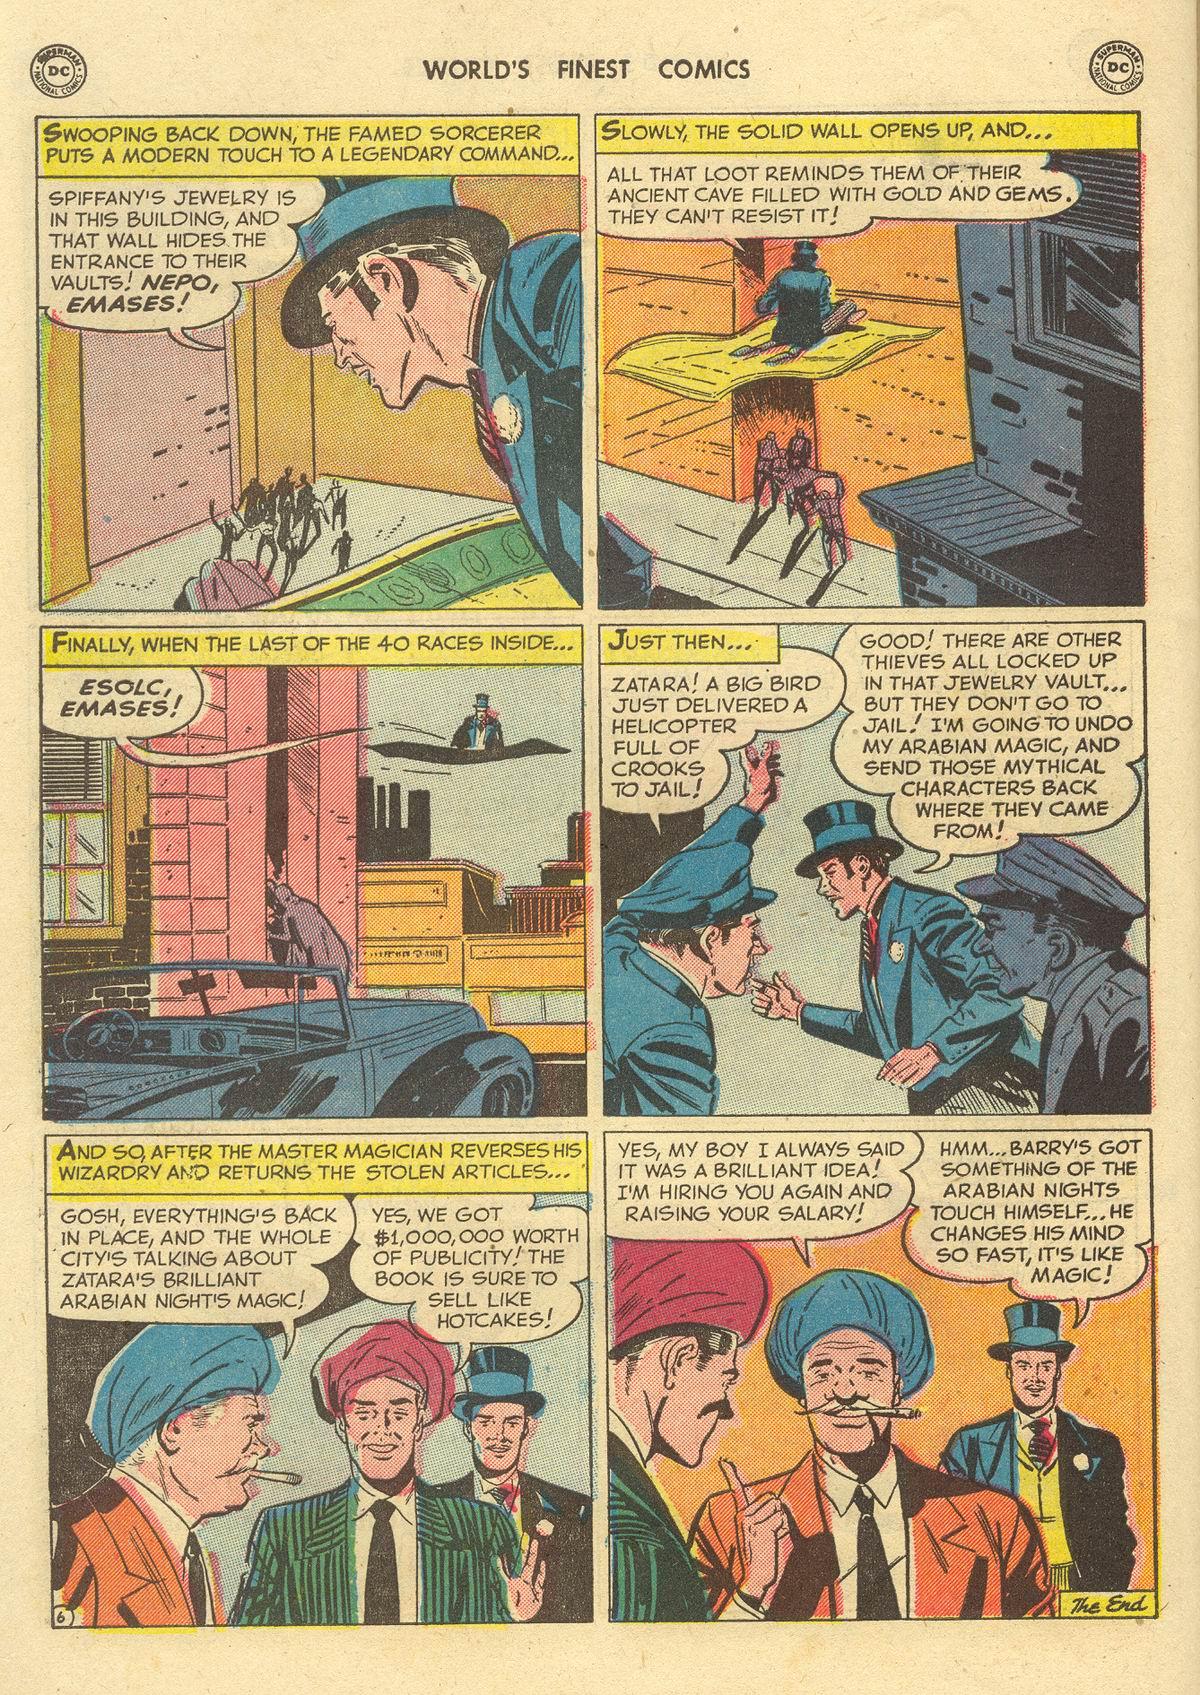 Read online World's Finest Comics comic -  Issue #51 - 60